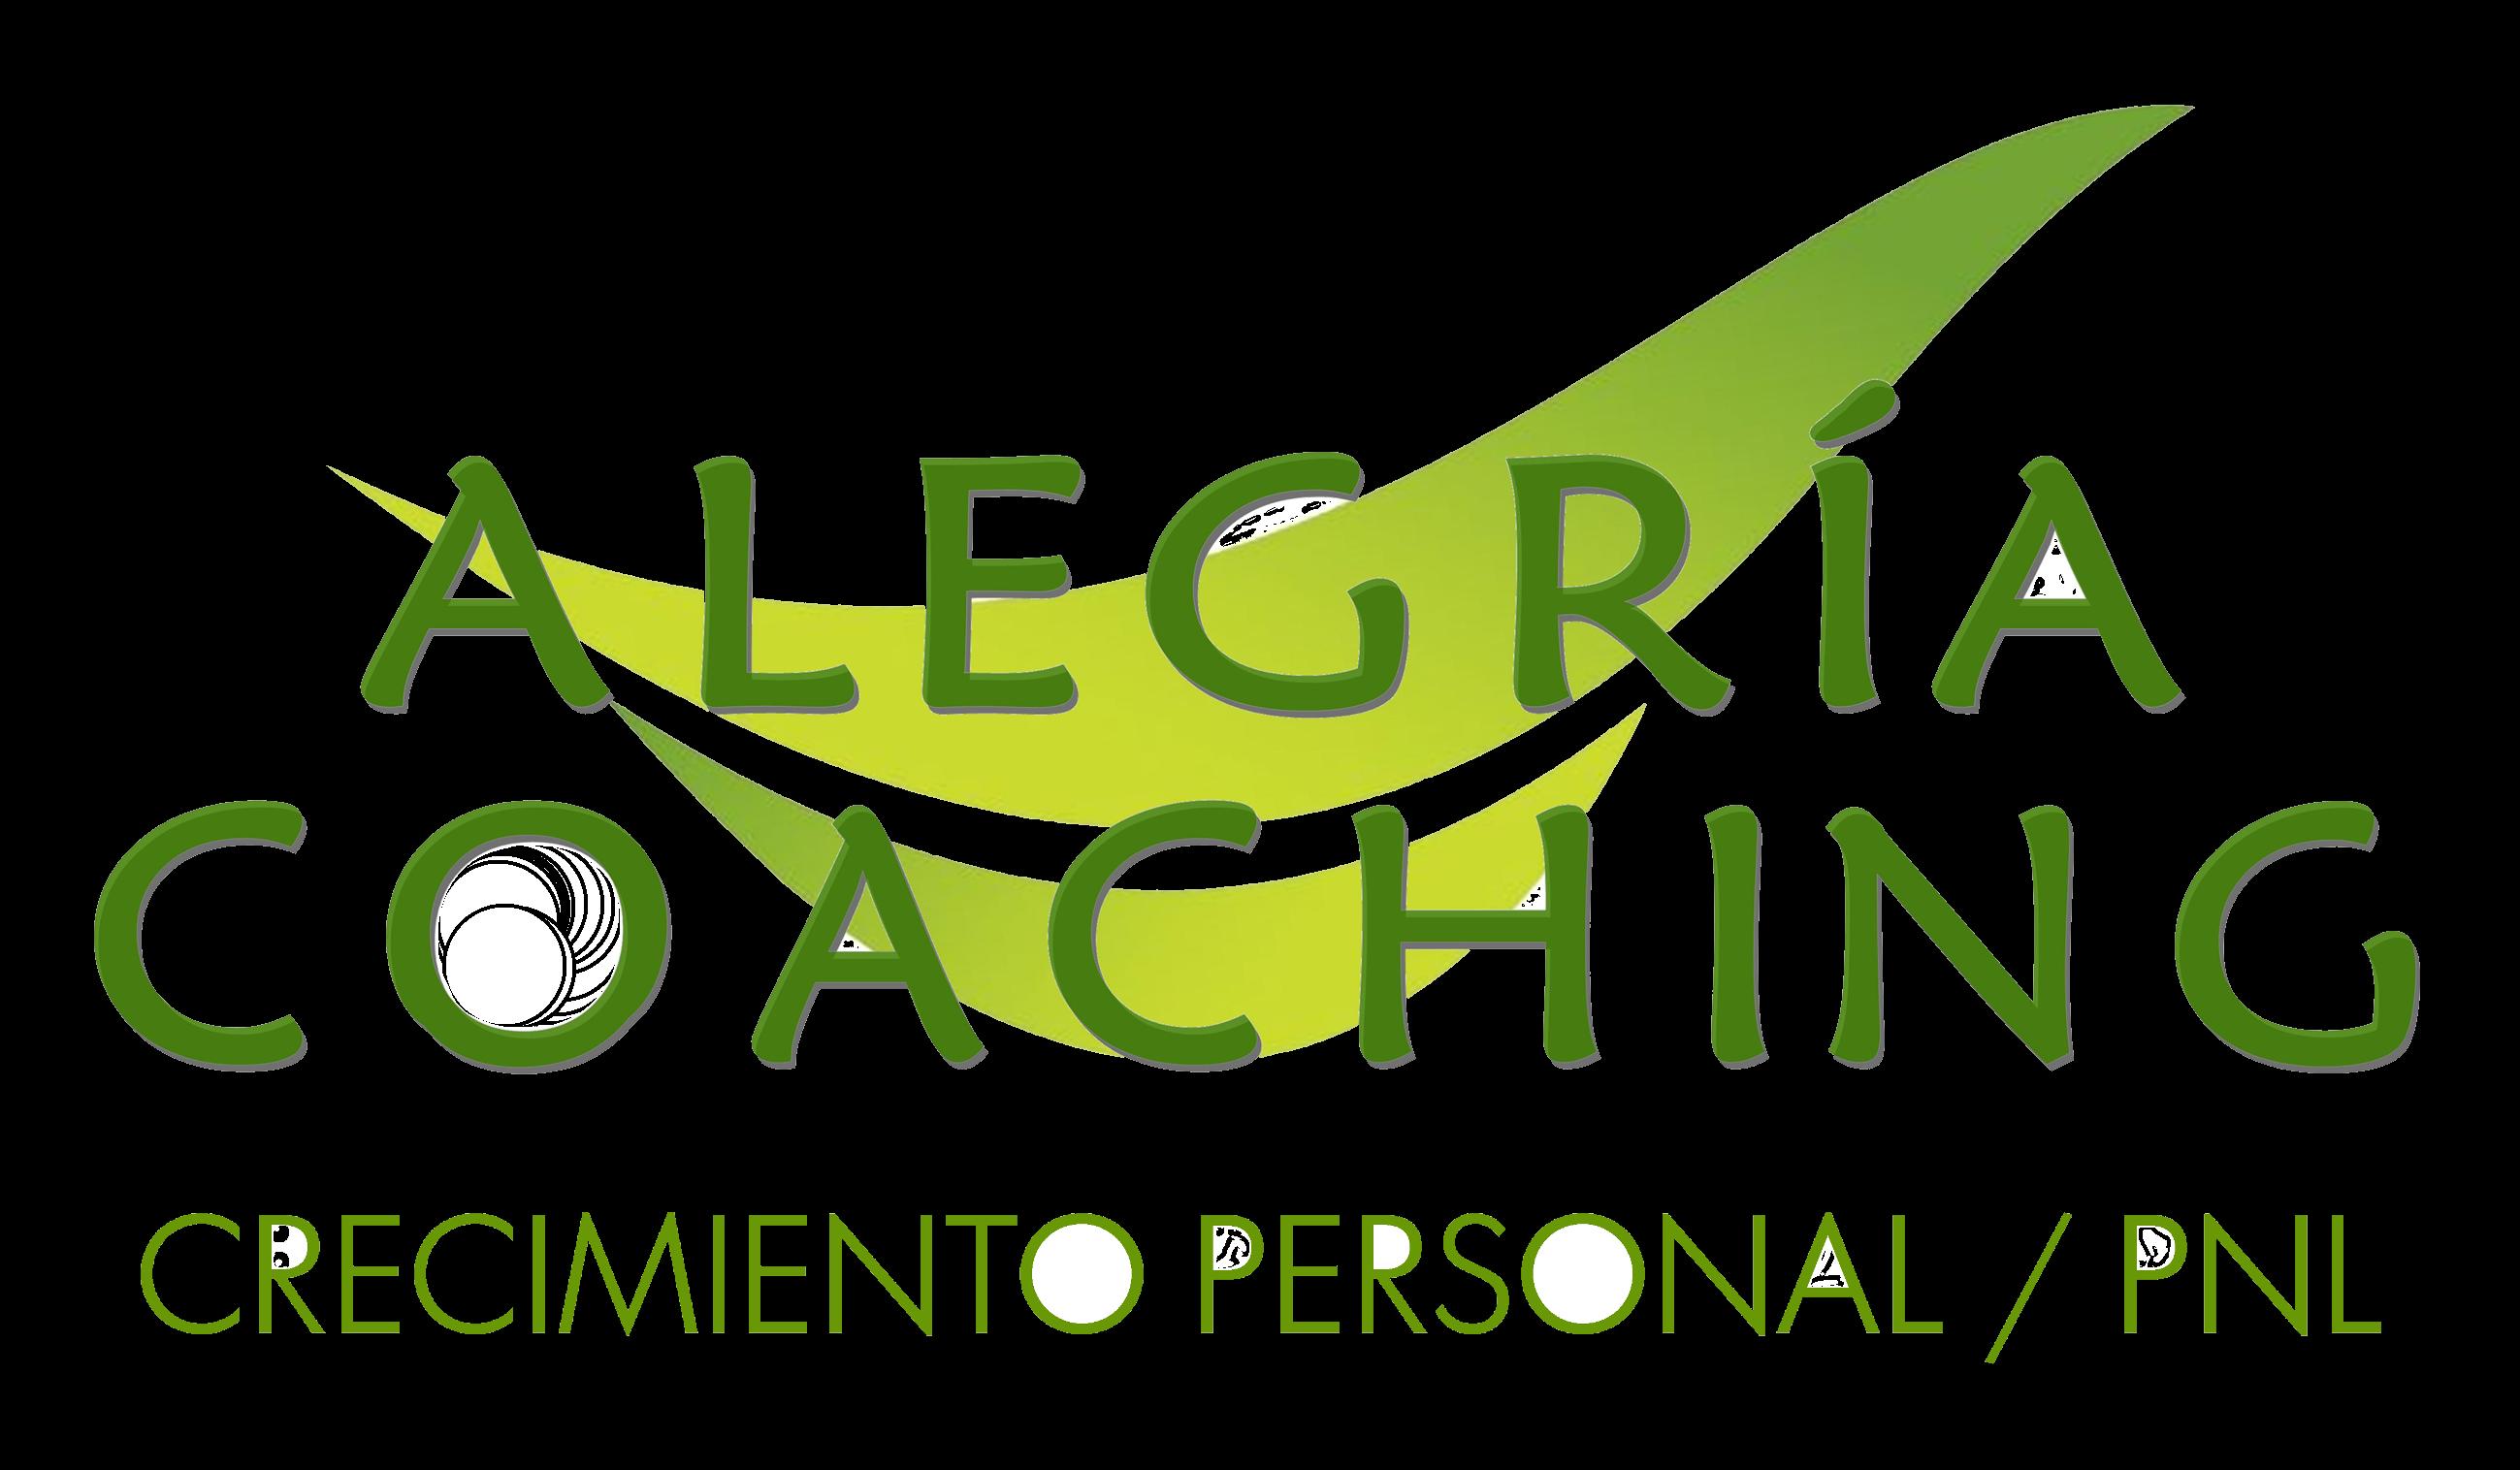 http://www.alegriacoaching.es/